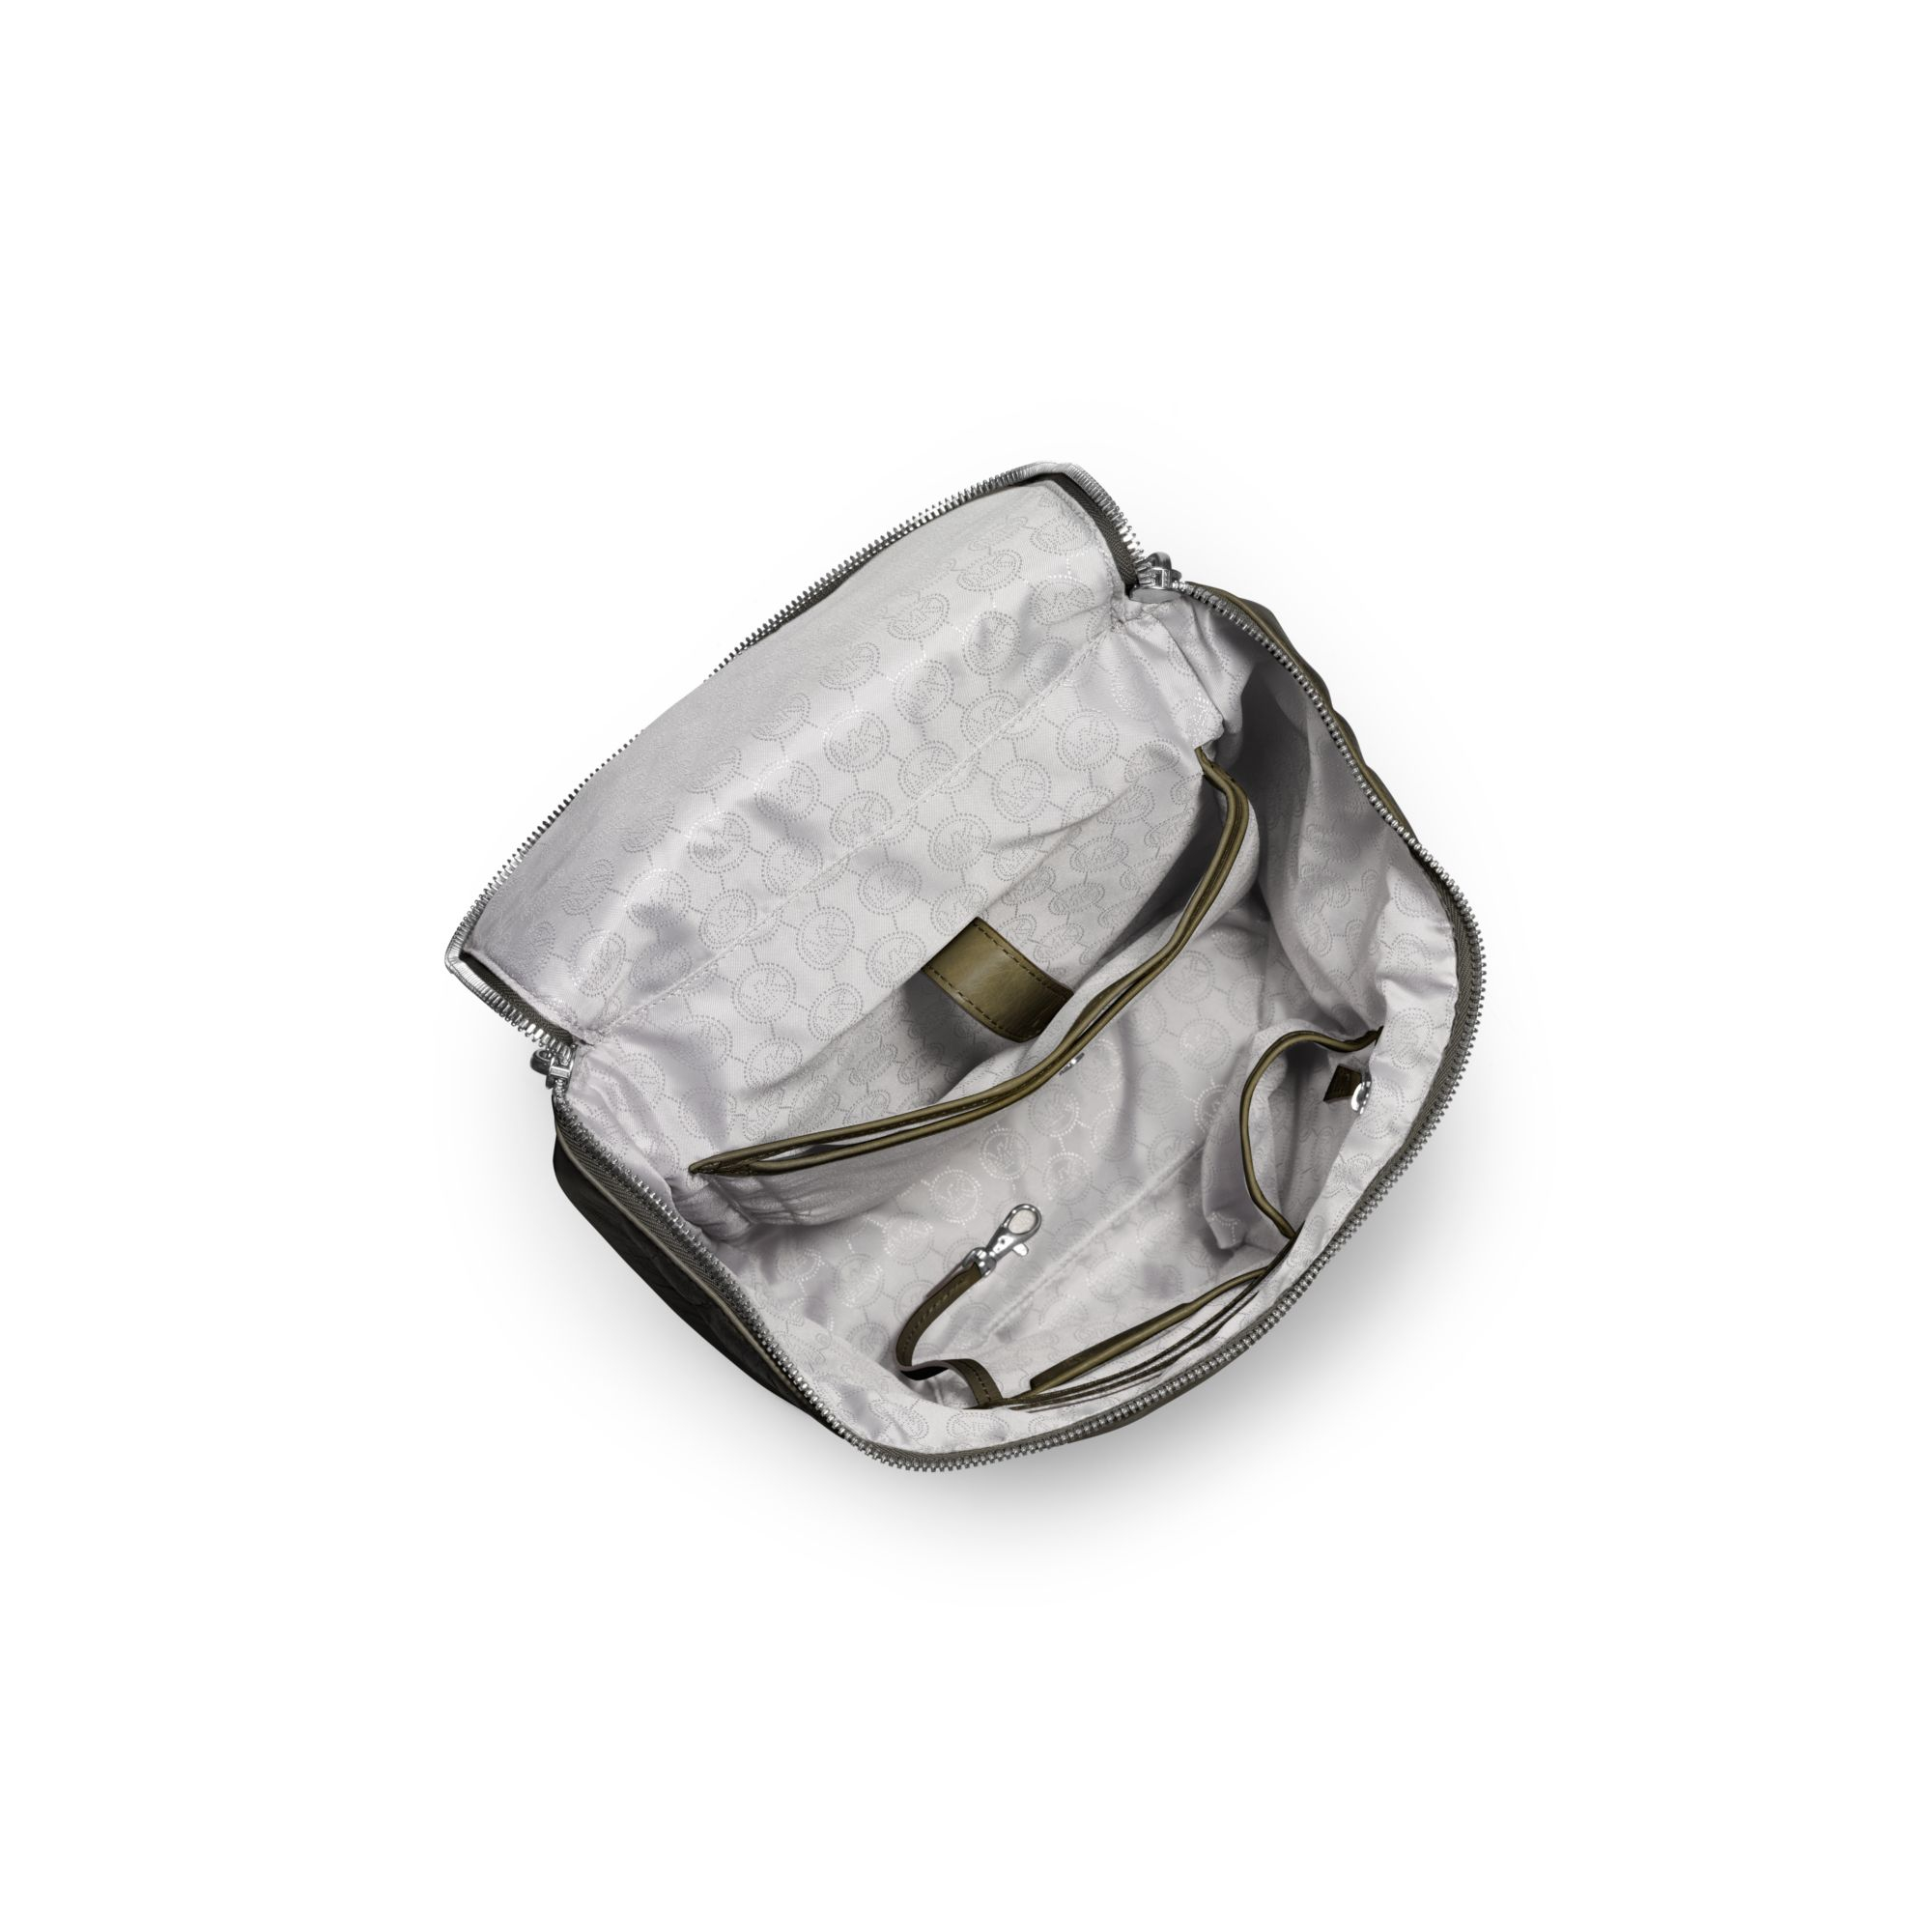 39e9b7b8b03e ... get lyst michael kors lisbeth leather medium backpack in green b9e1a  b8cae ...